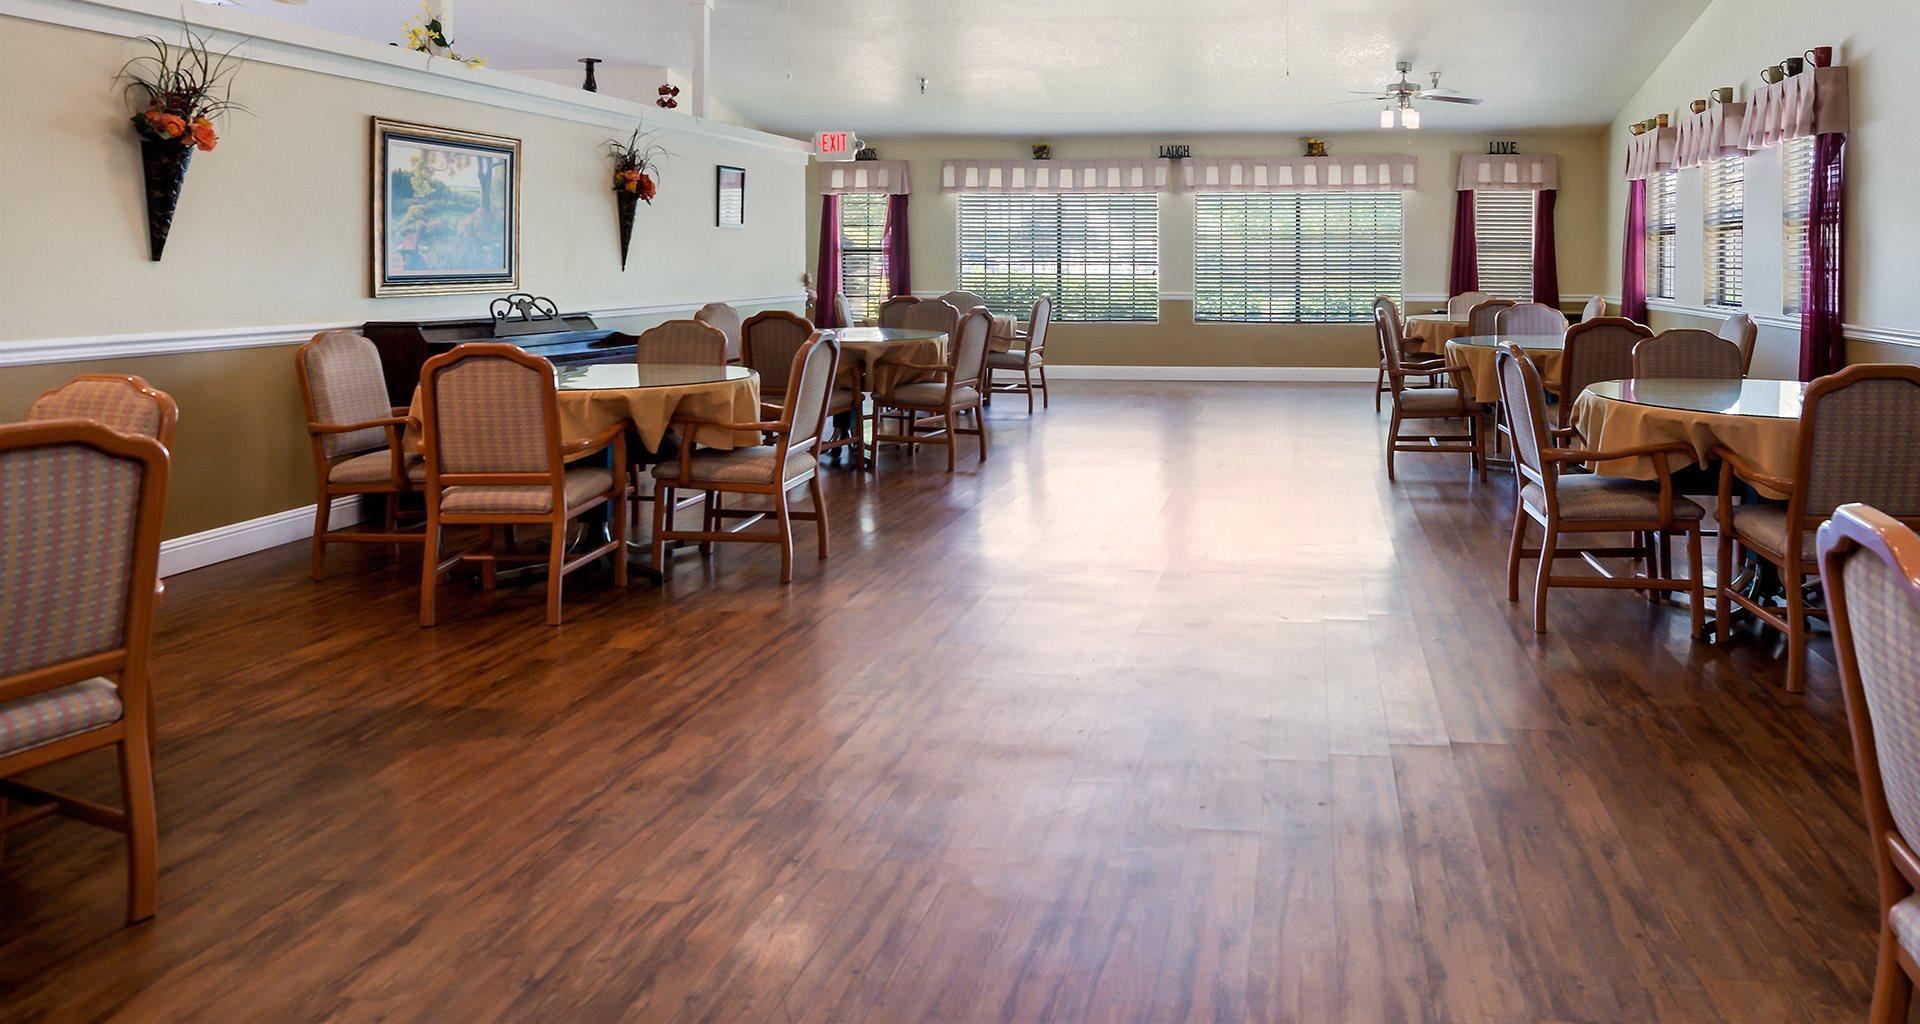 Hardwood Floors Community Kitchen at Valley Crest Memory Care, California, 92307